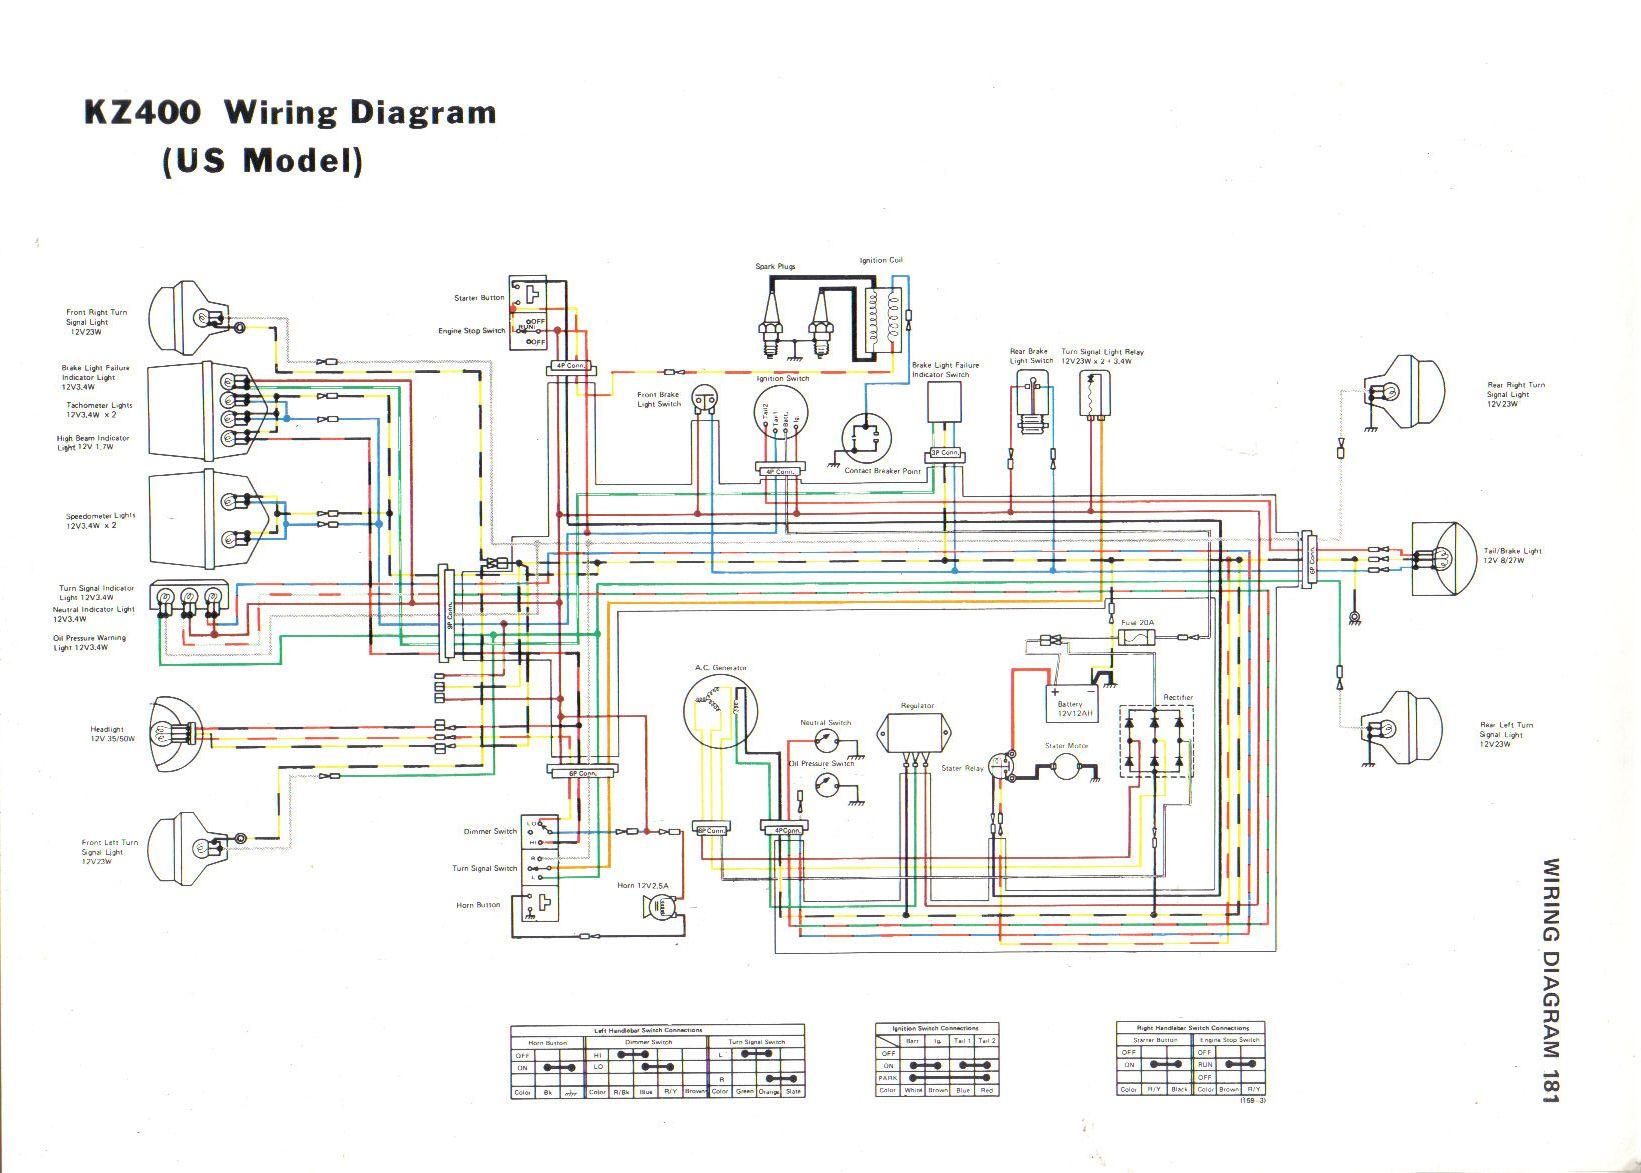 WRG-2077] Kz400 Wiring Diagram on